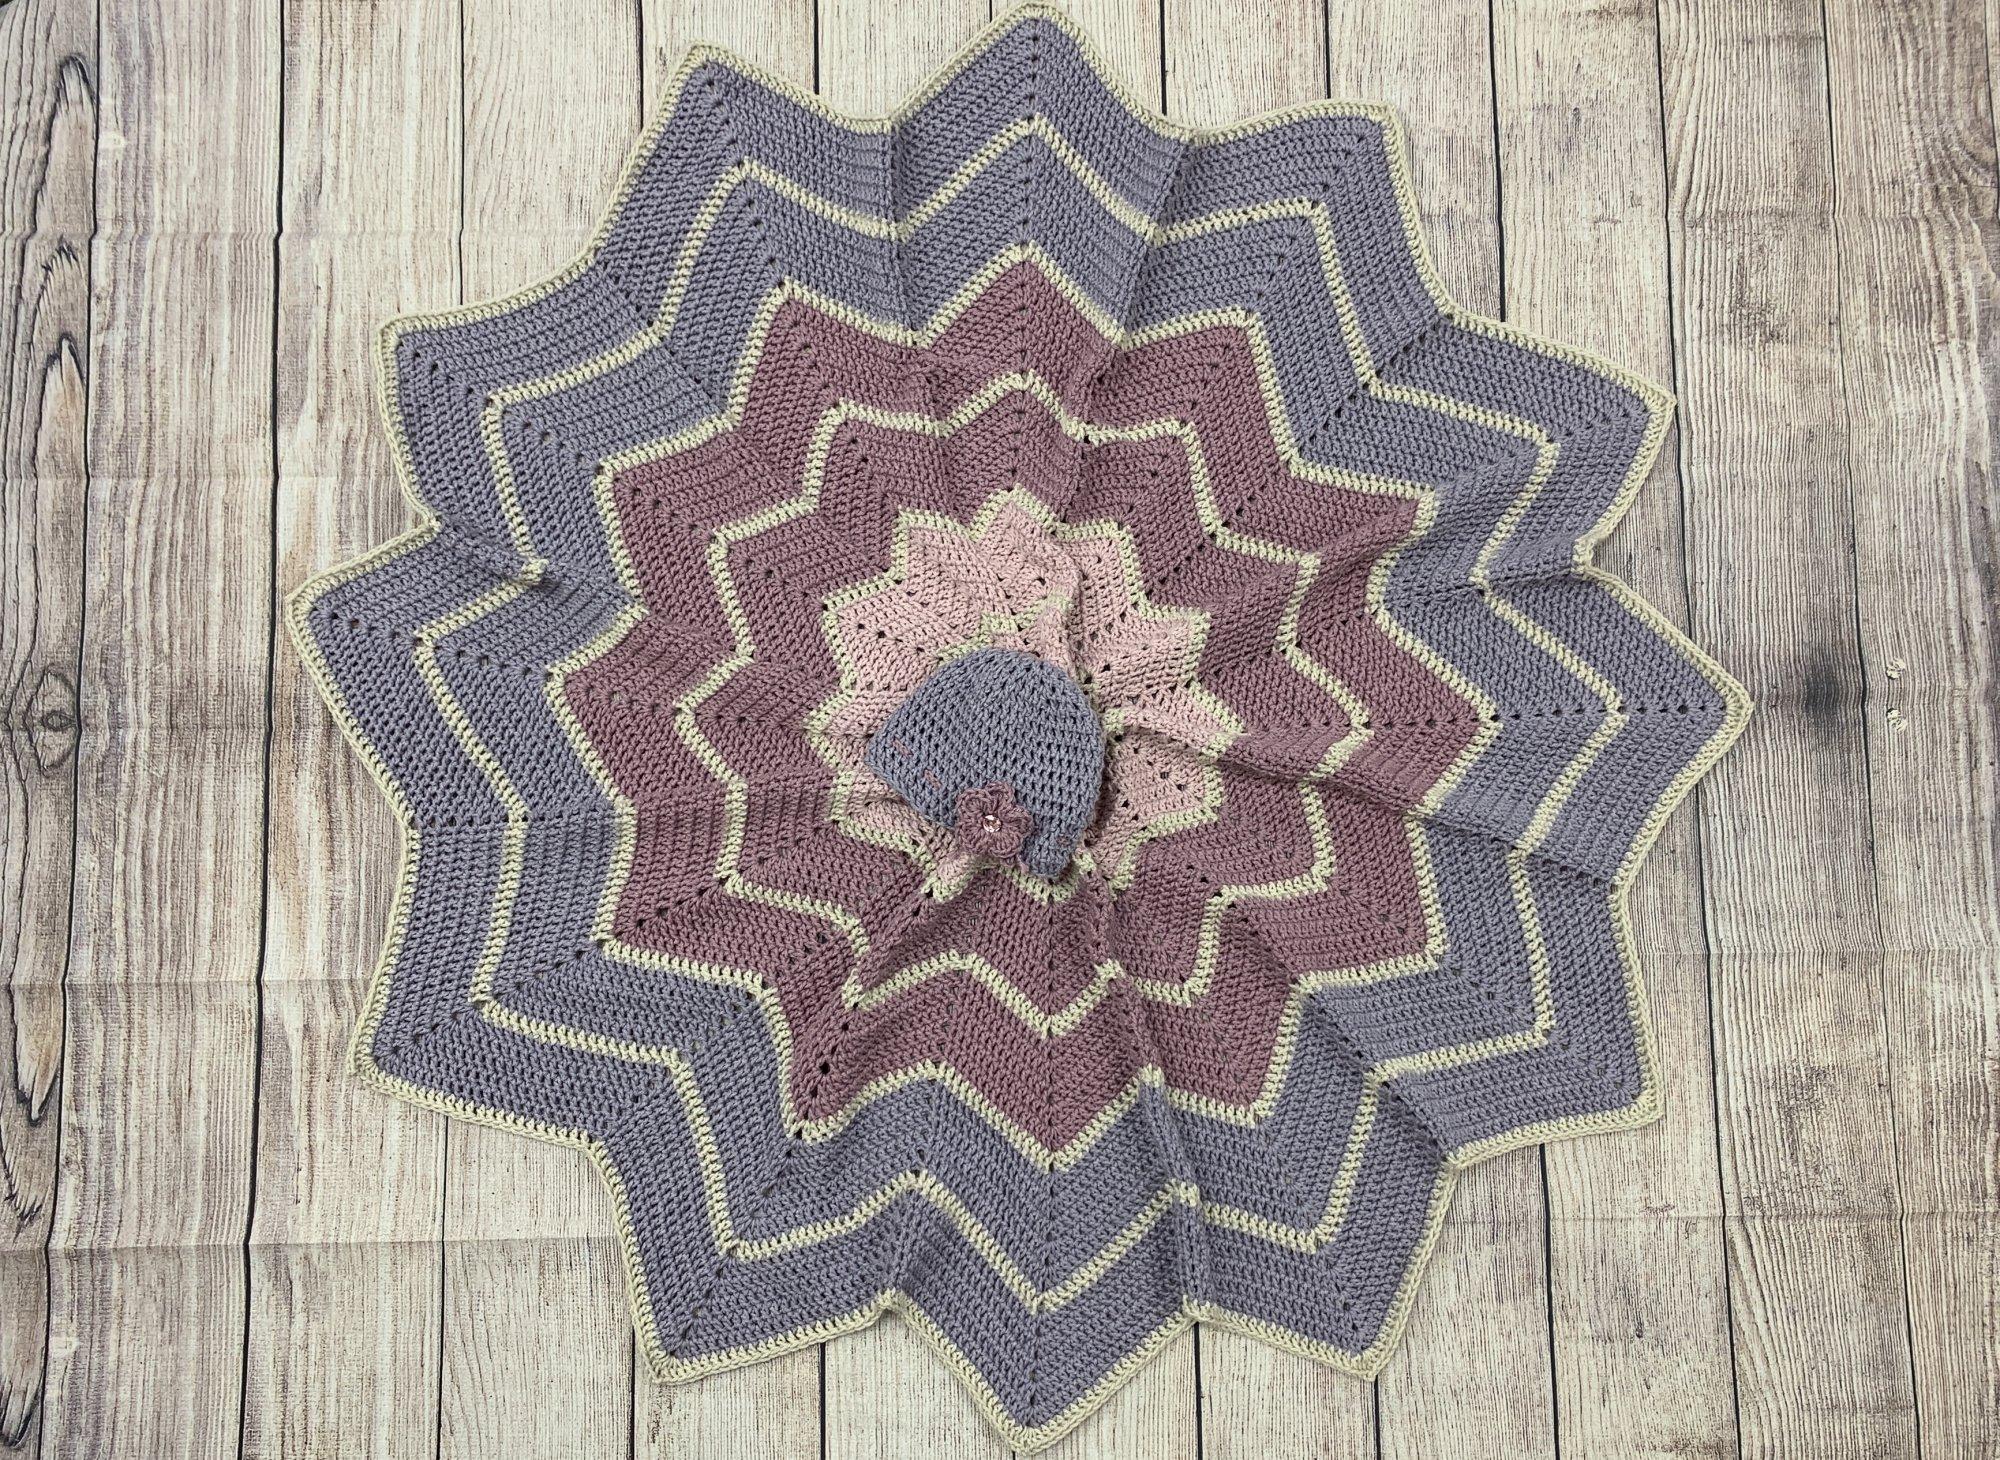 Rainbow Ripple Crochet Baby Blanket Kit